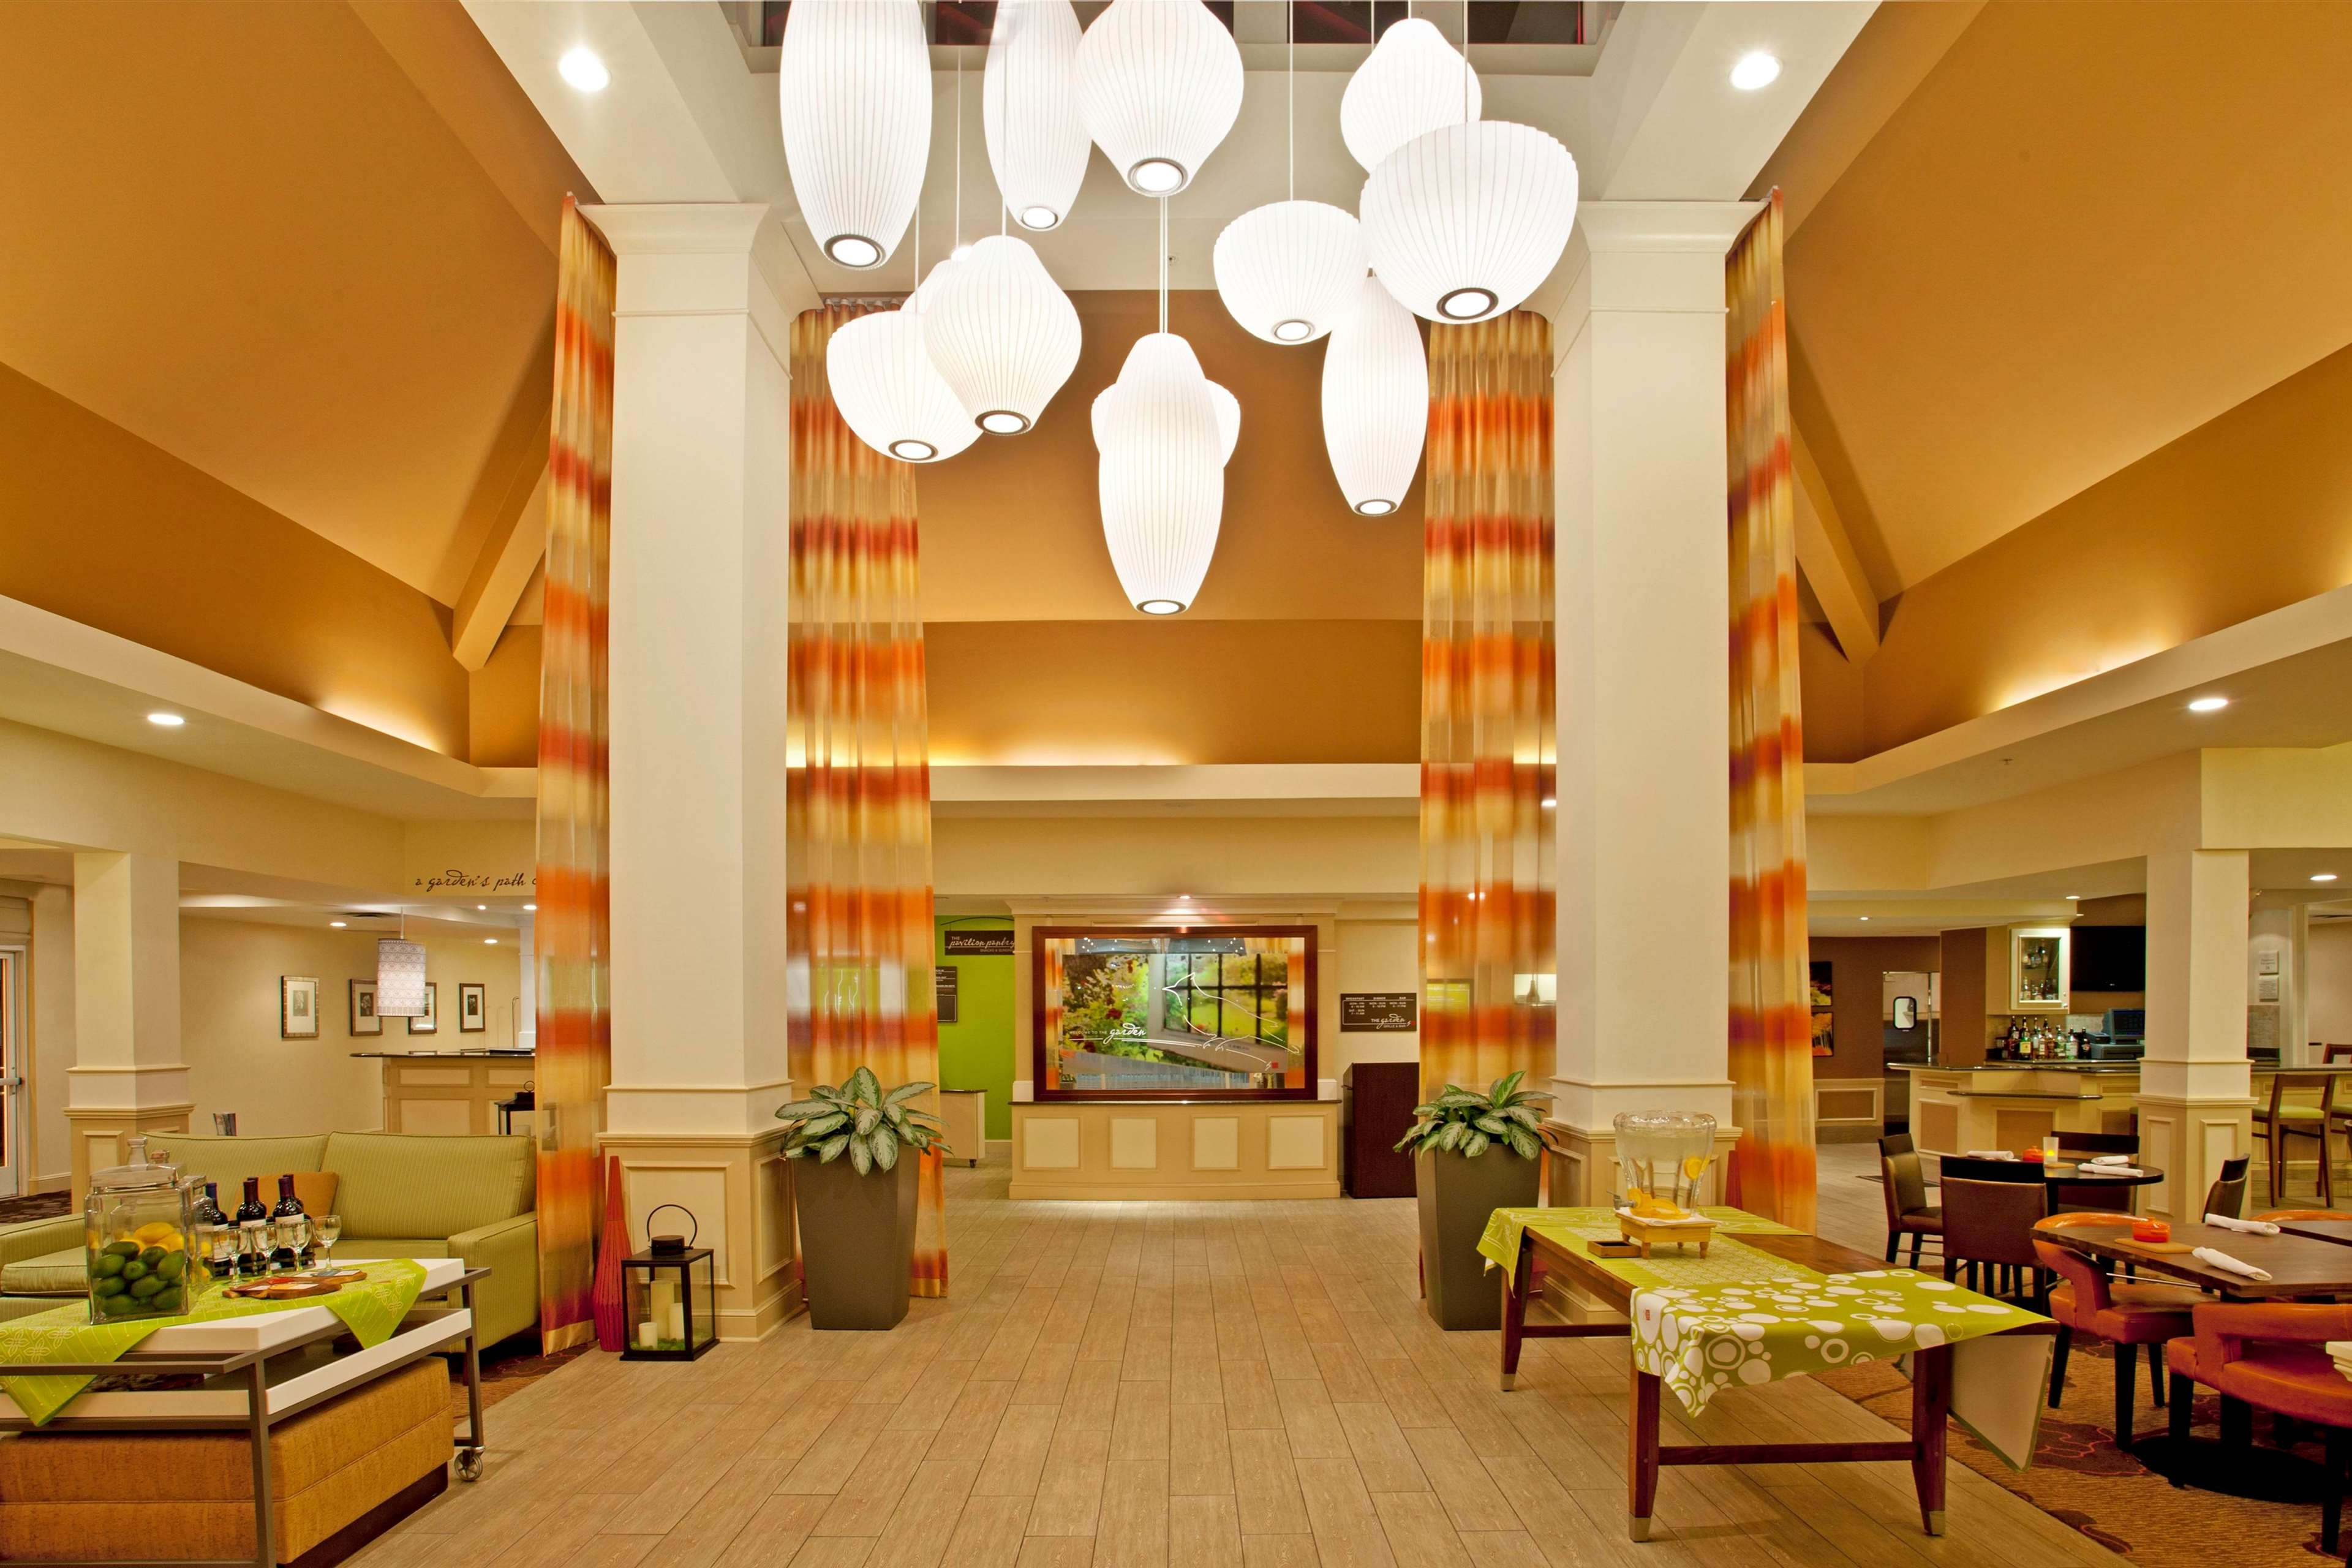 Hilton Garden Inn Fort Collins image 15